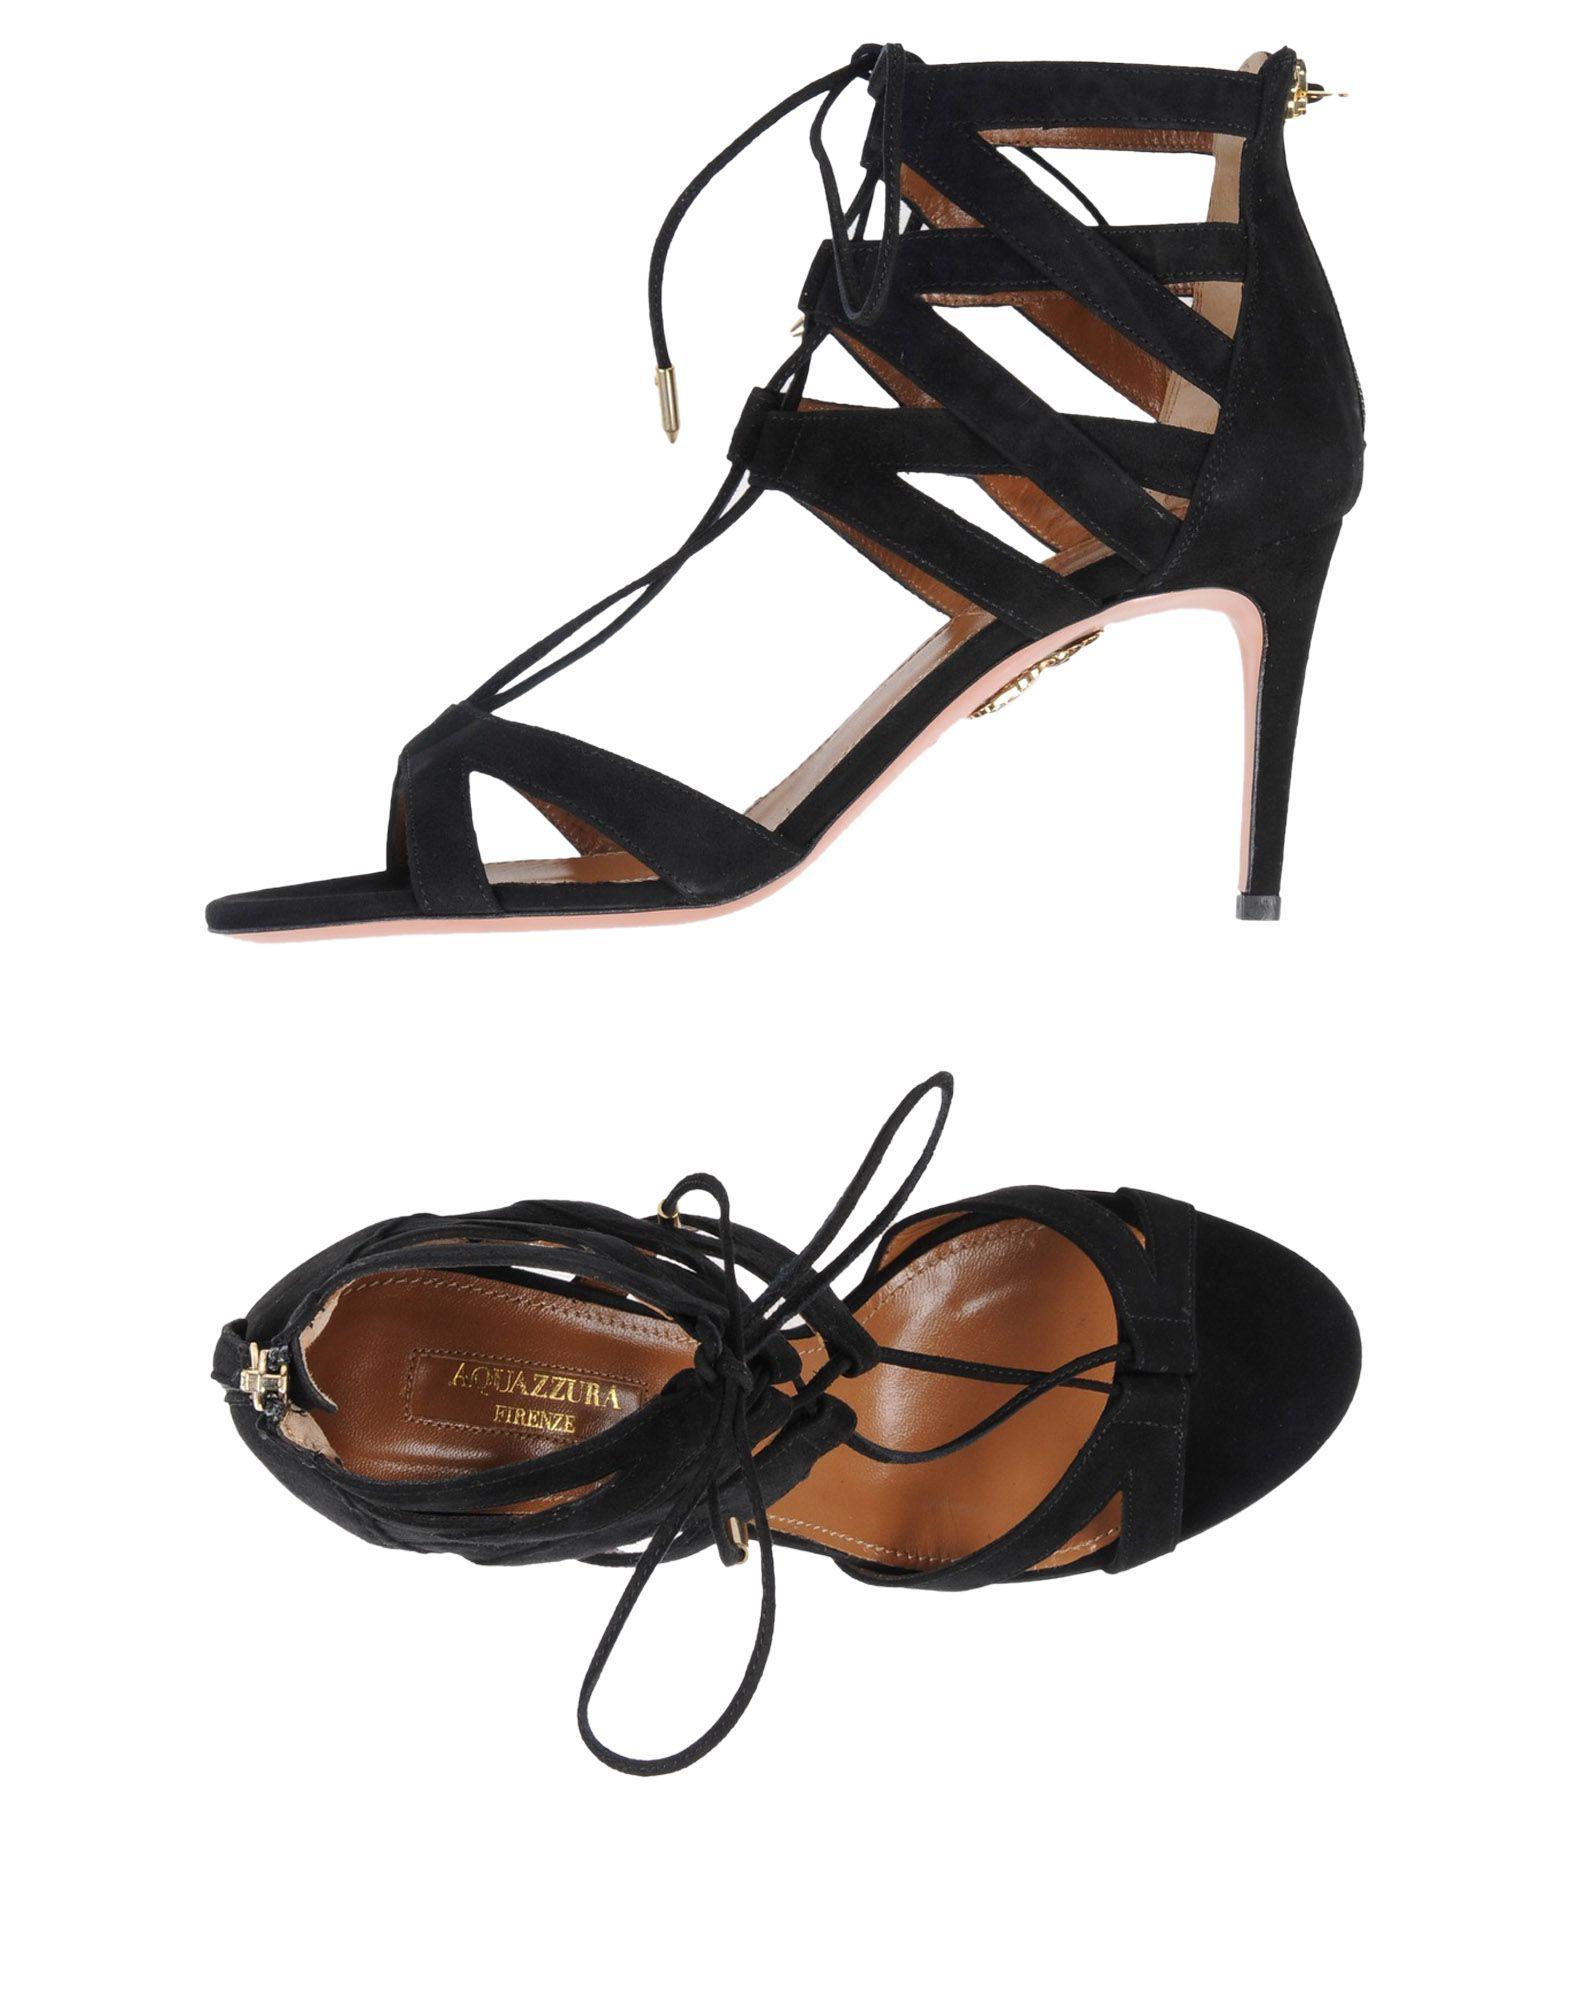 Sandali Aquazzura Donna - distintive 11451796VN Scarpe comode e distintive - c81928